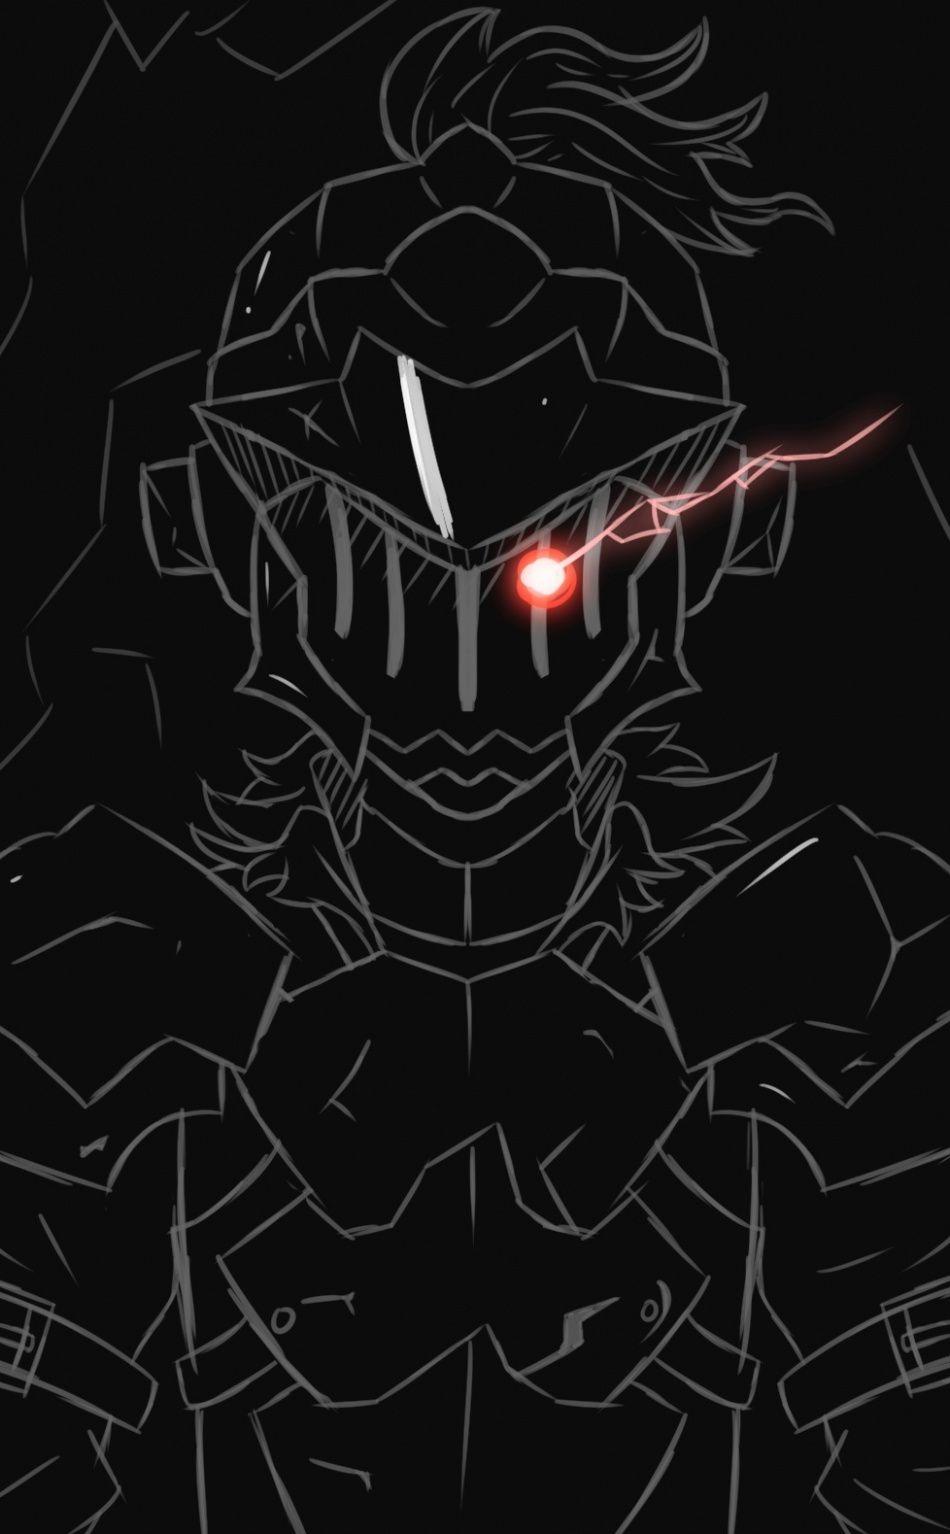 Dark Sketch Art Goblin Slayer Anime 950x1534 Wallpaper Goblin Art Sketches Slayer